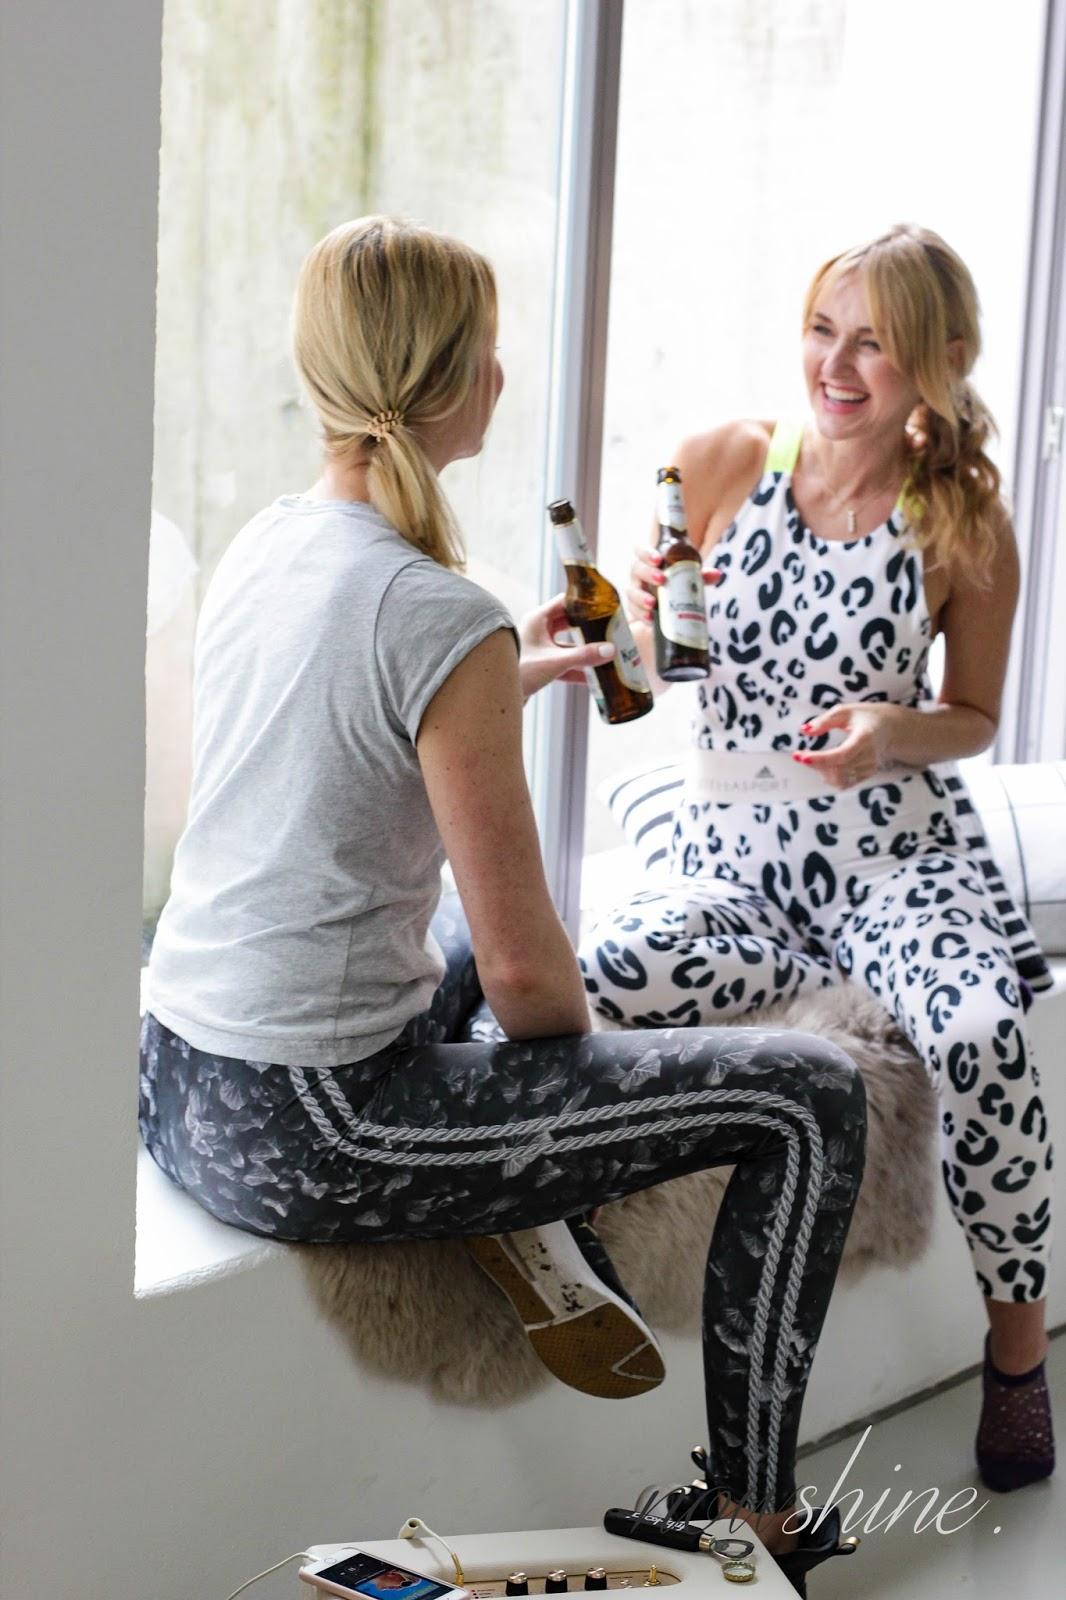 Krombacher Alkoholfrei Motivation Fitness